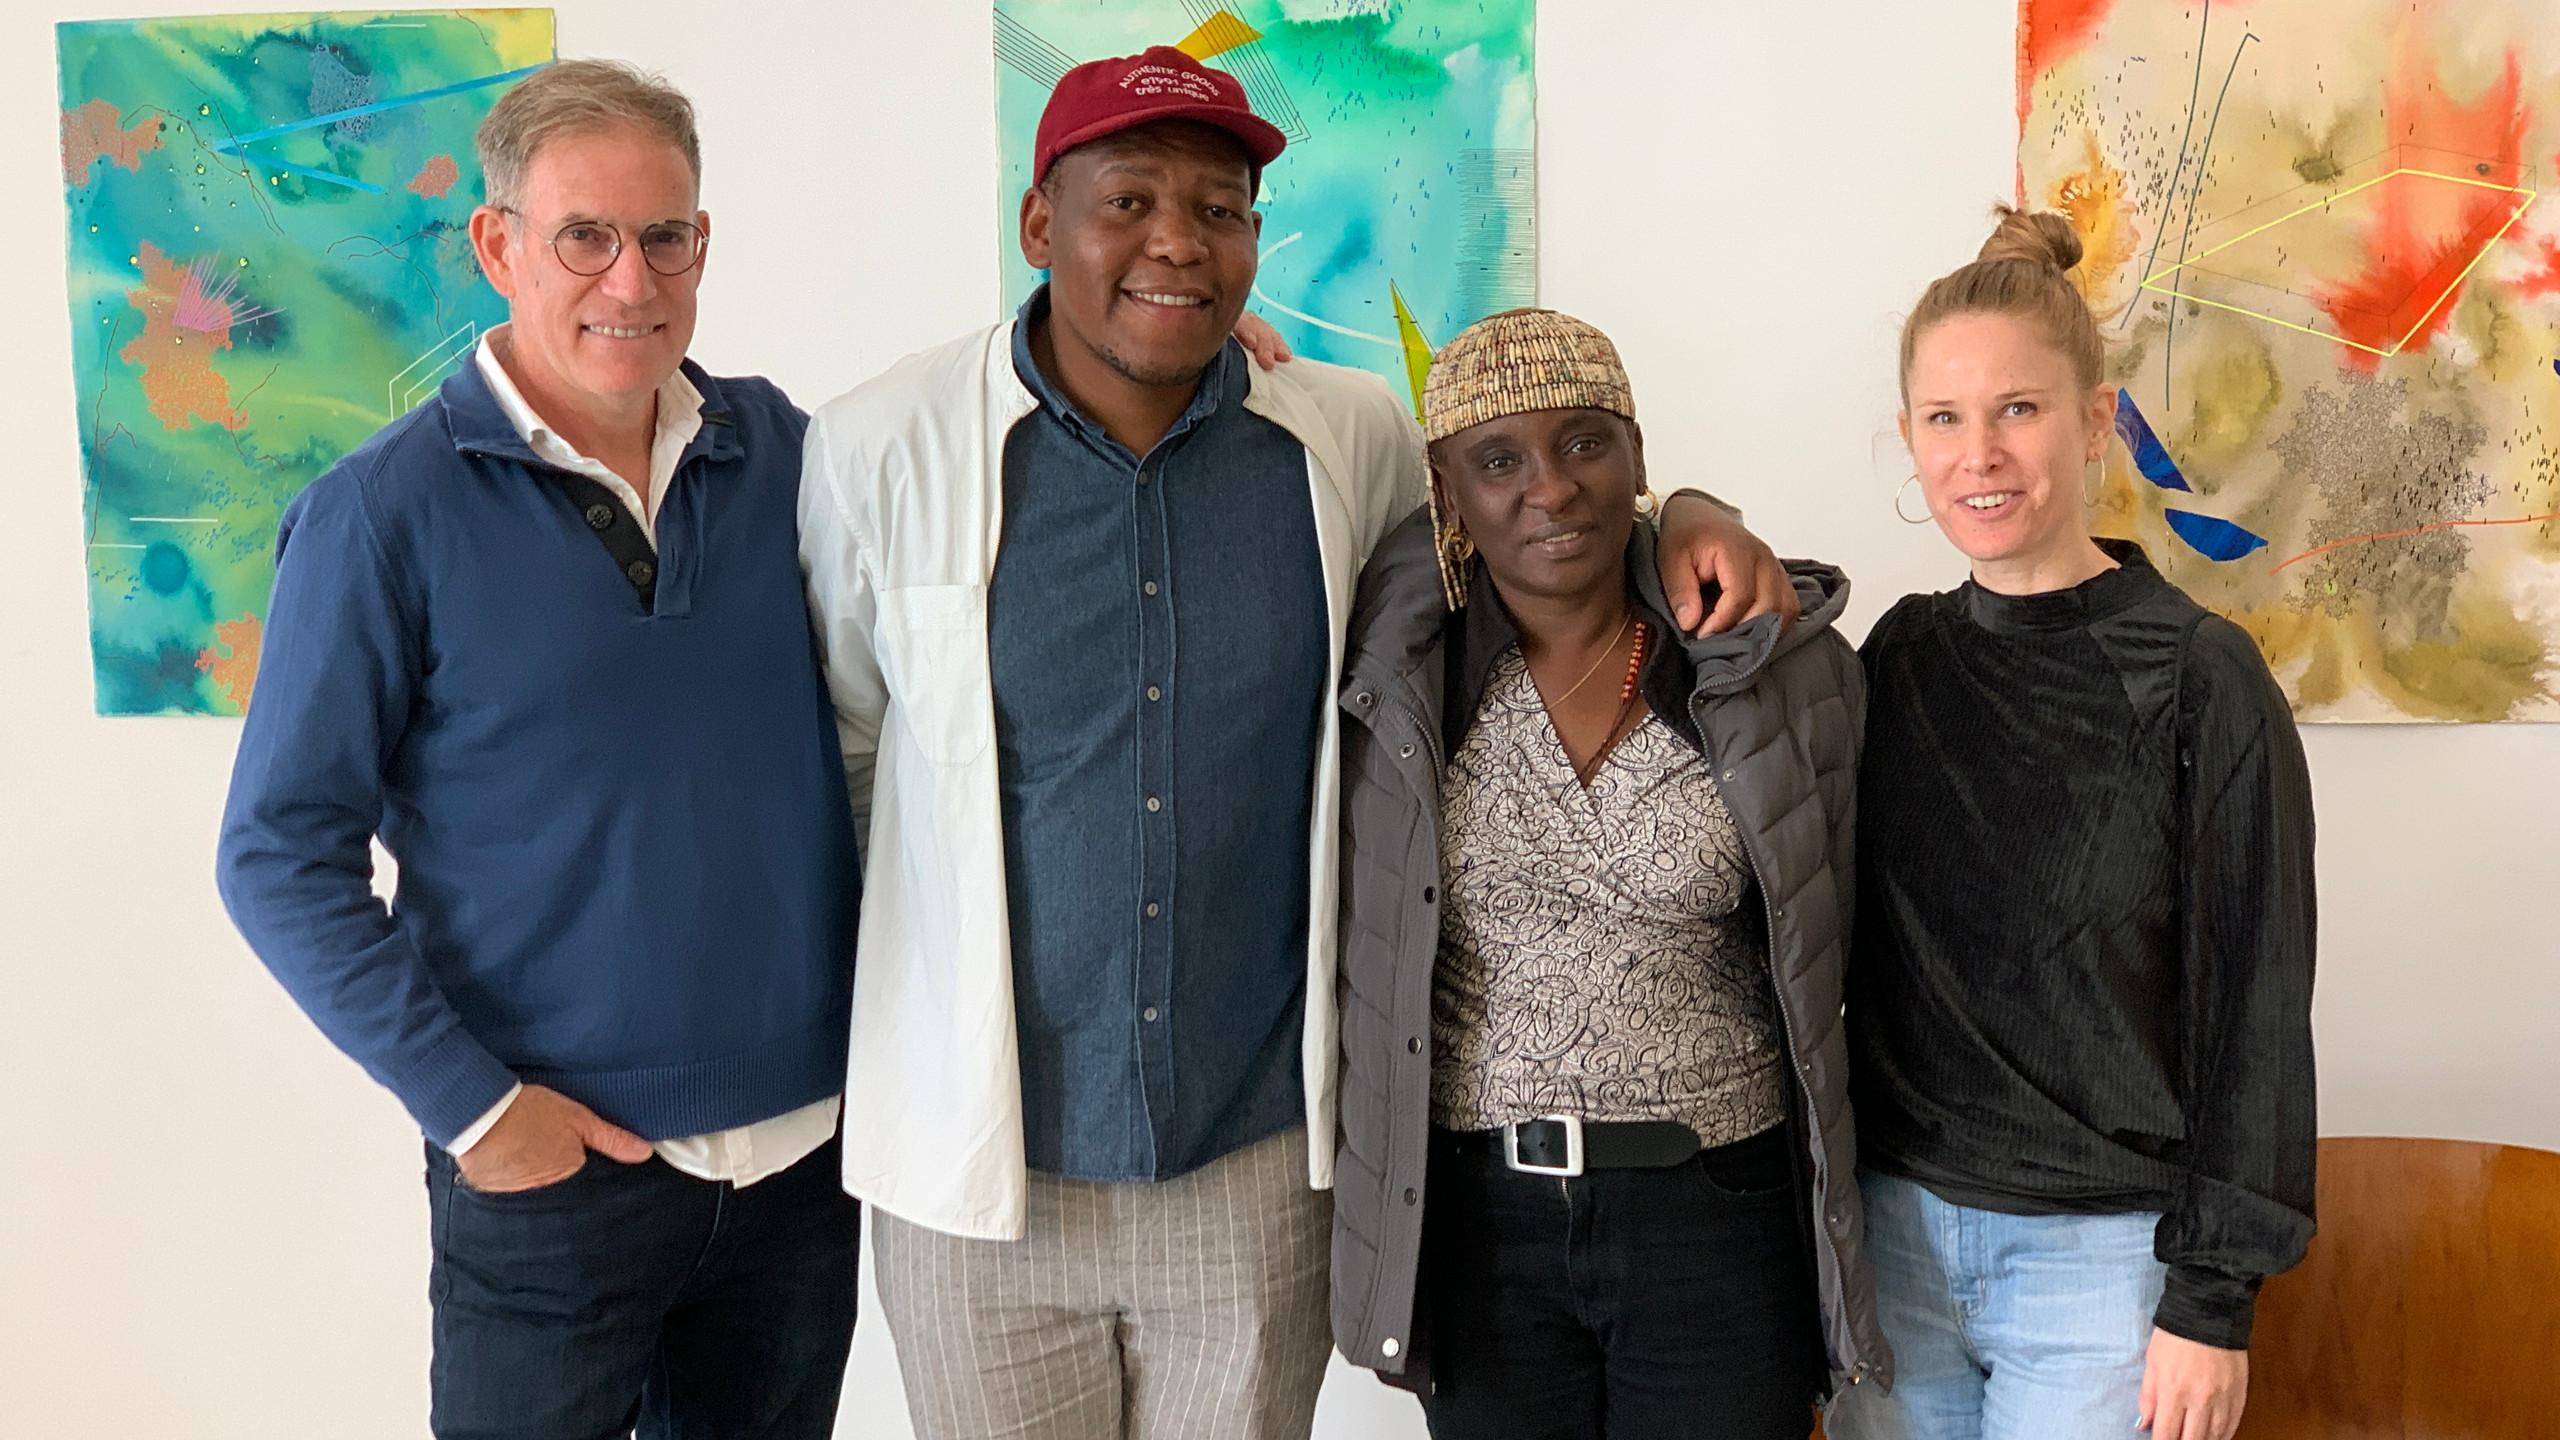 Mongezi Ncaphayi's preview exhibition